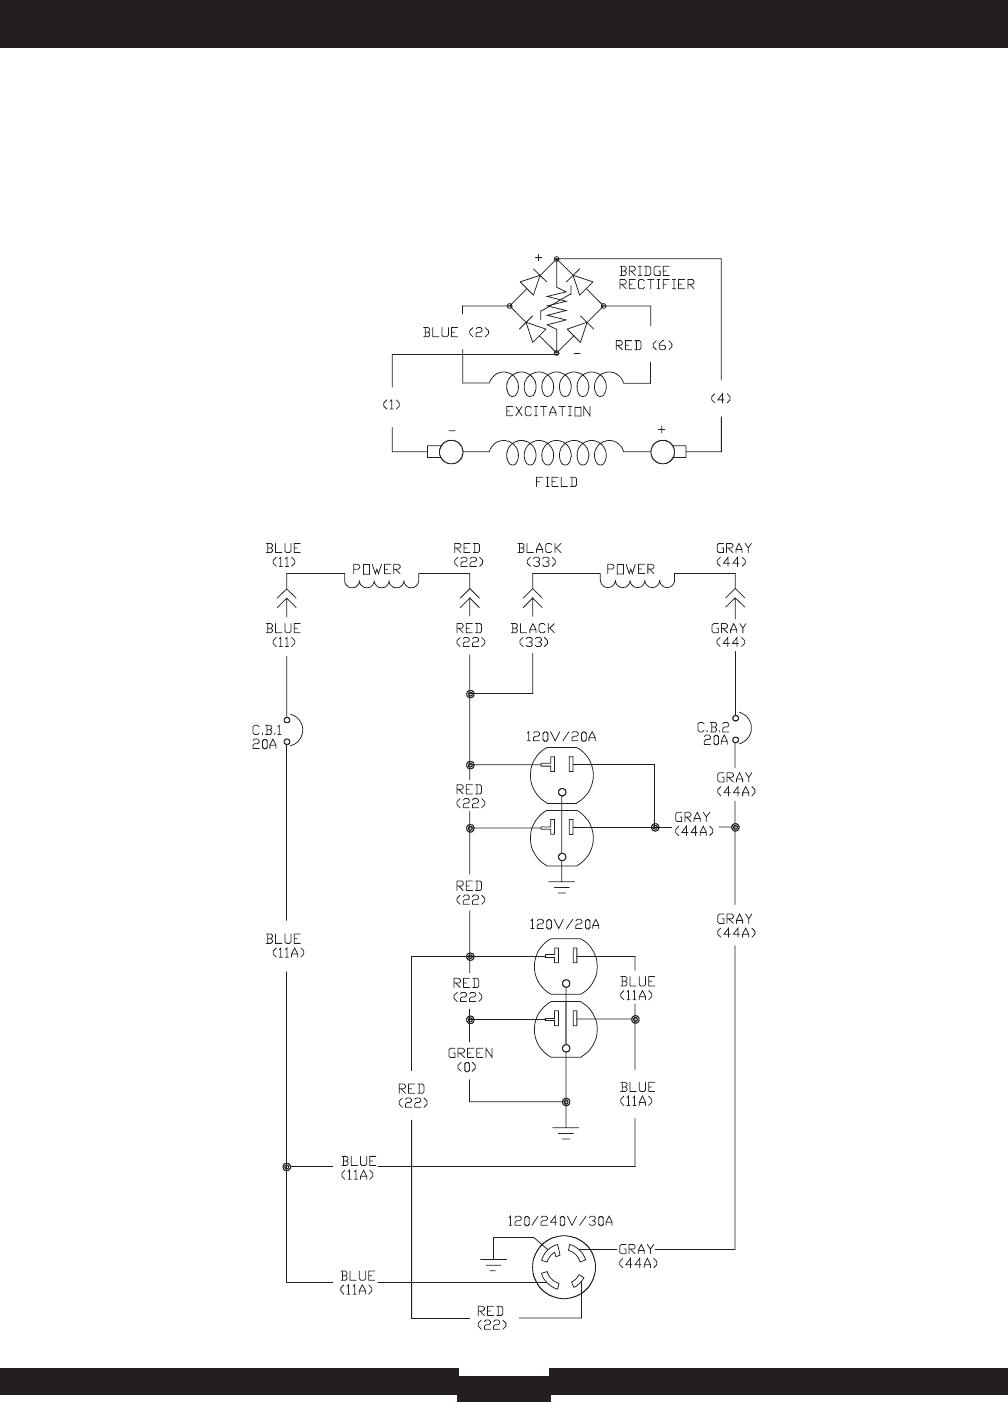 Generac Generator Wiring Diagram / Generac 9091 0 Generac